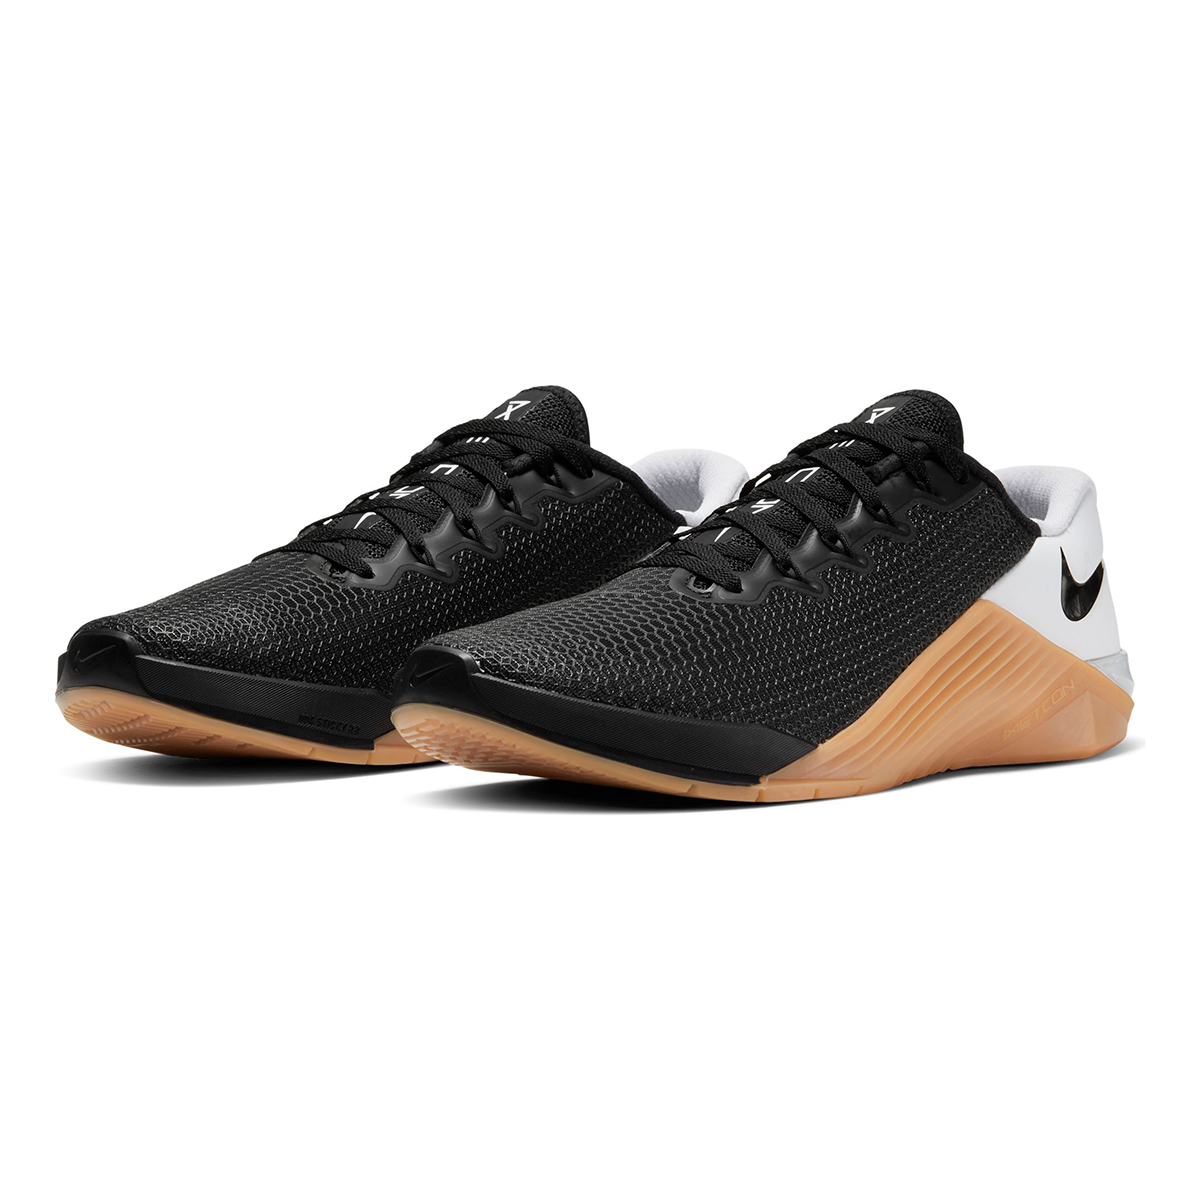 Men's Nike Metcon 5 Training Shoes  - Color: Black/White/Gum Med Brown - Size: 5 - Width: Regular, Black/White/Gum Med Brown, large, image 4